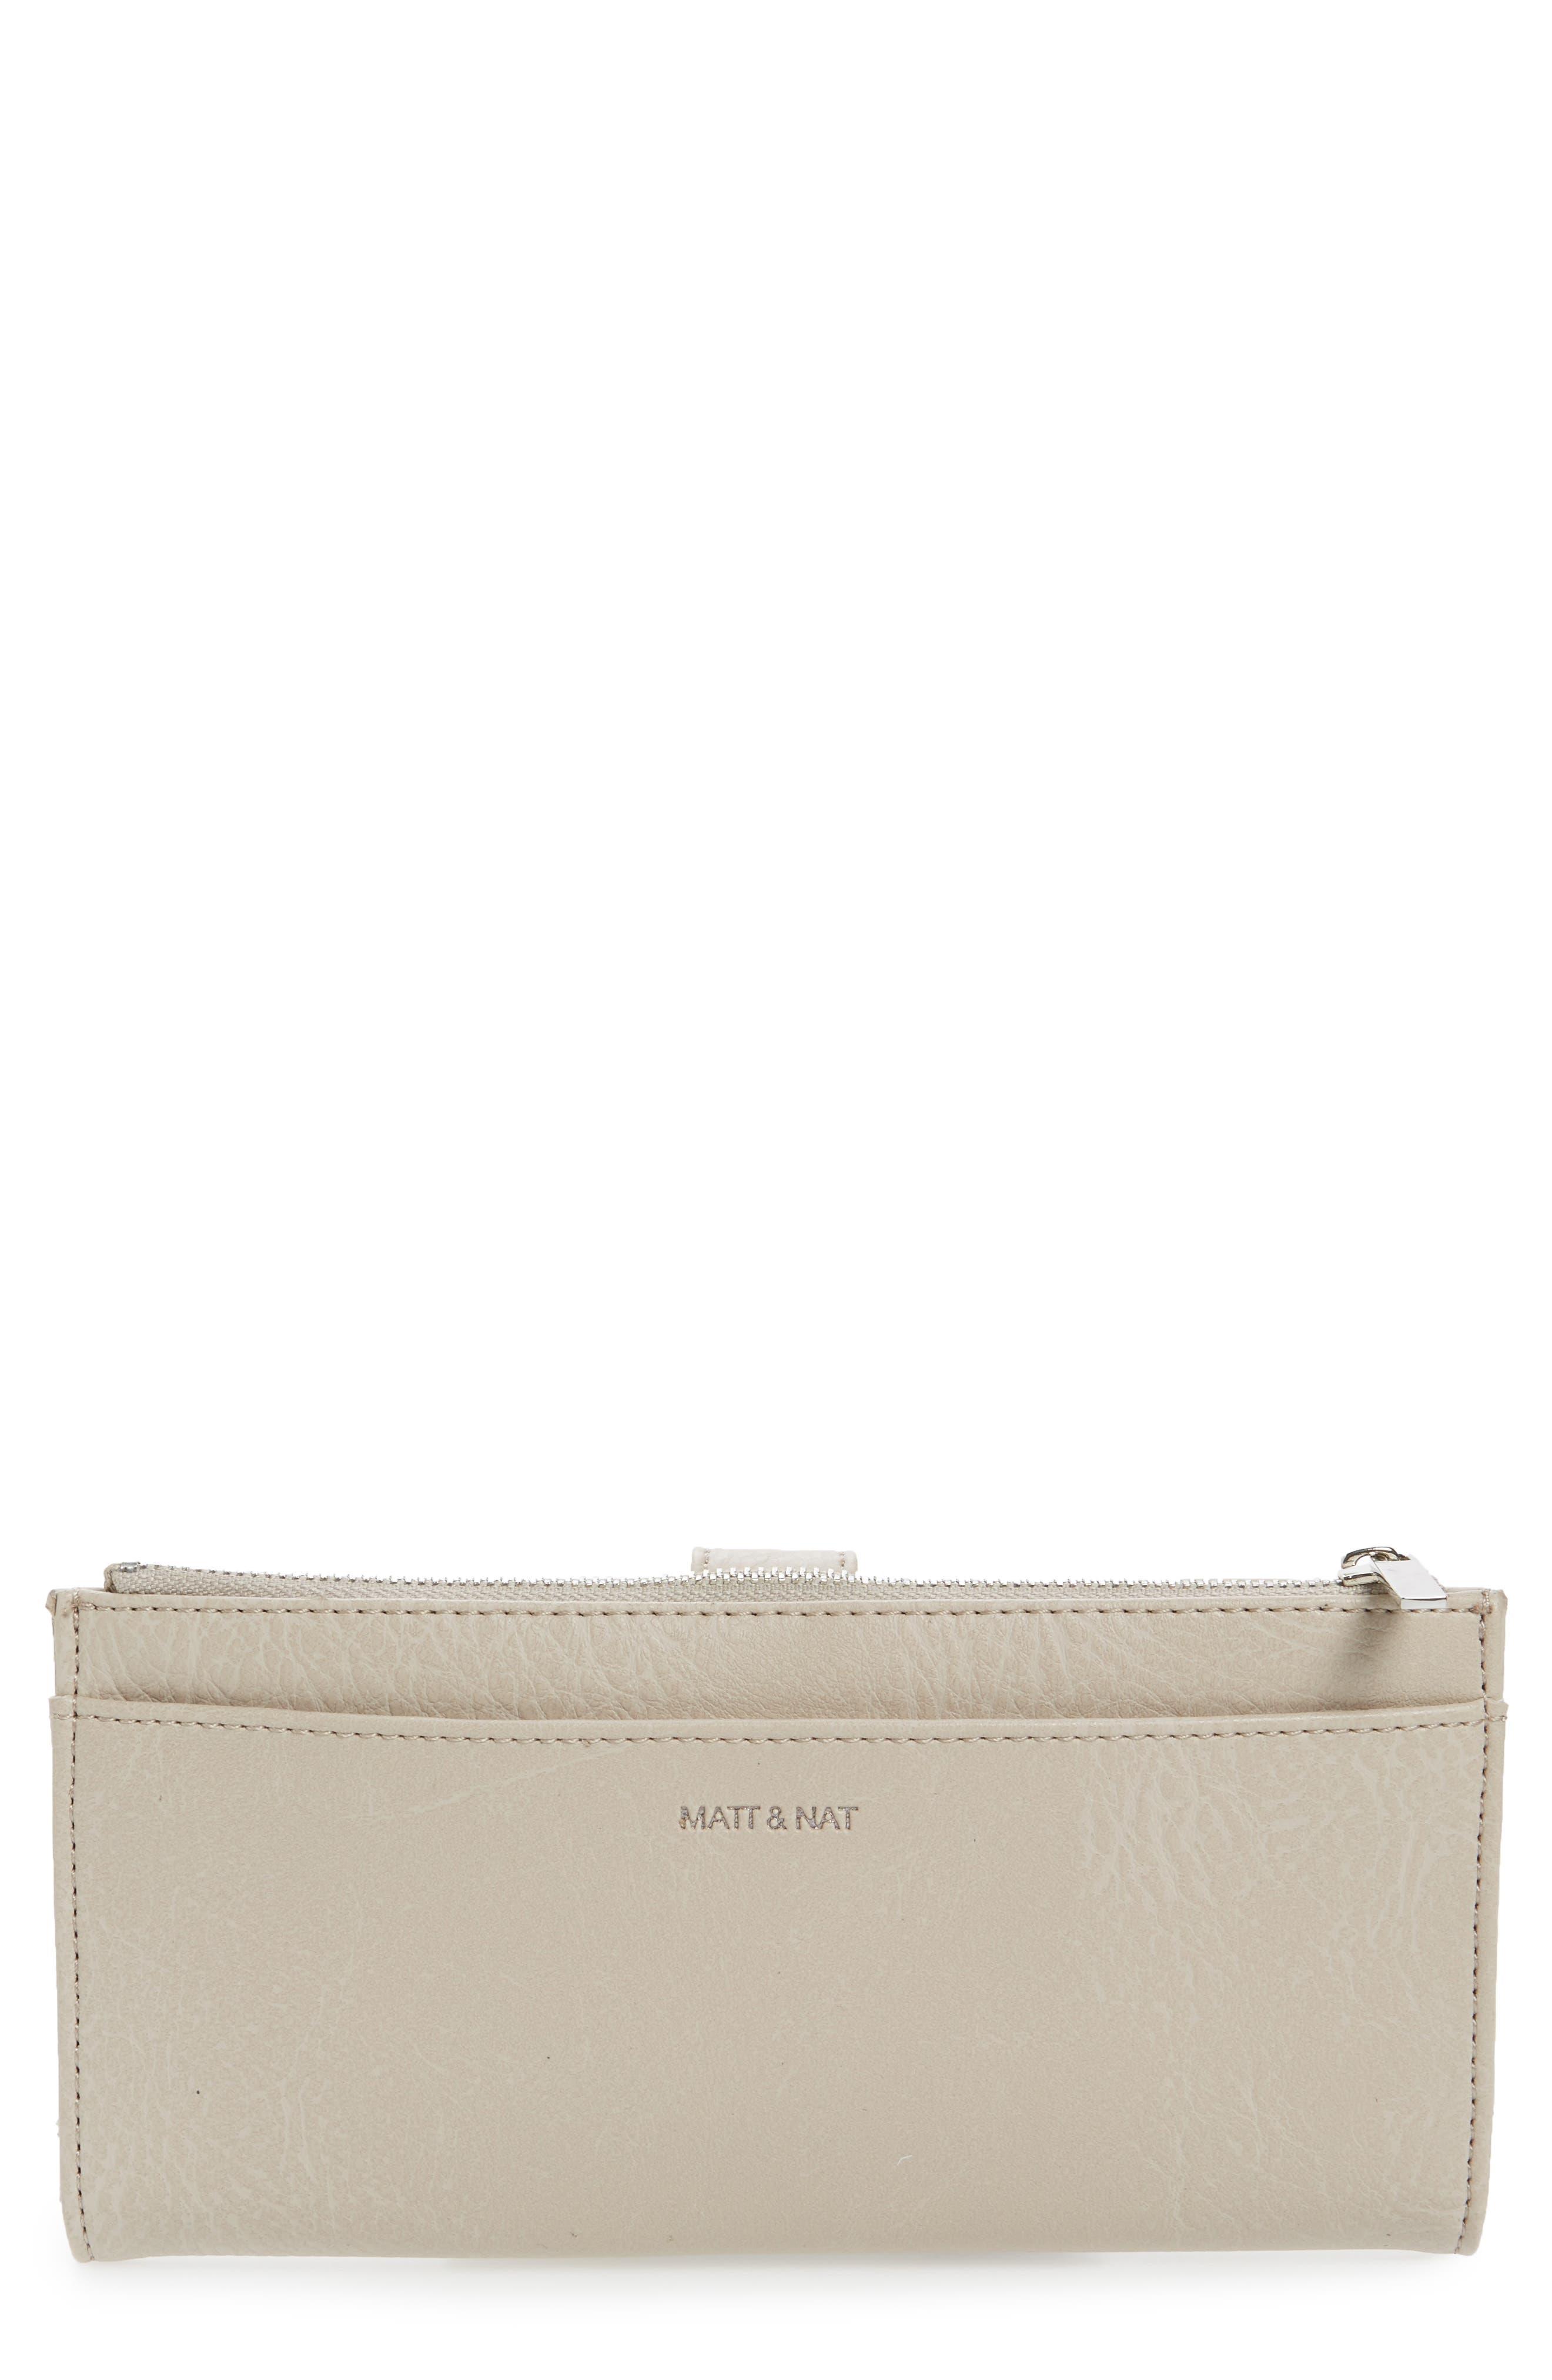 Matt & Nat Motiv Faux Leather Continental Wallet - Beige